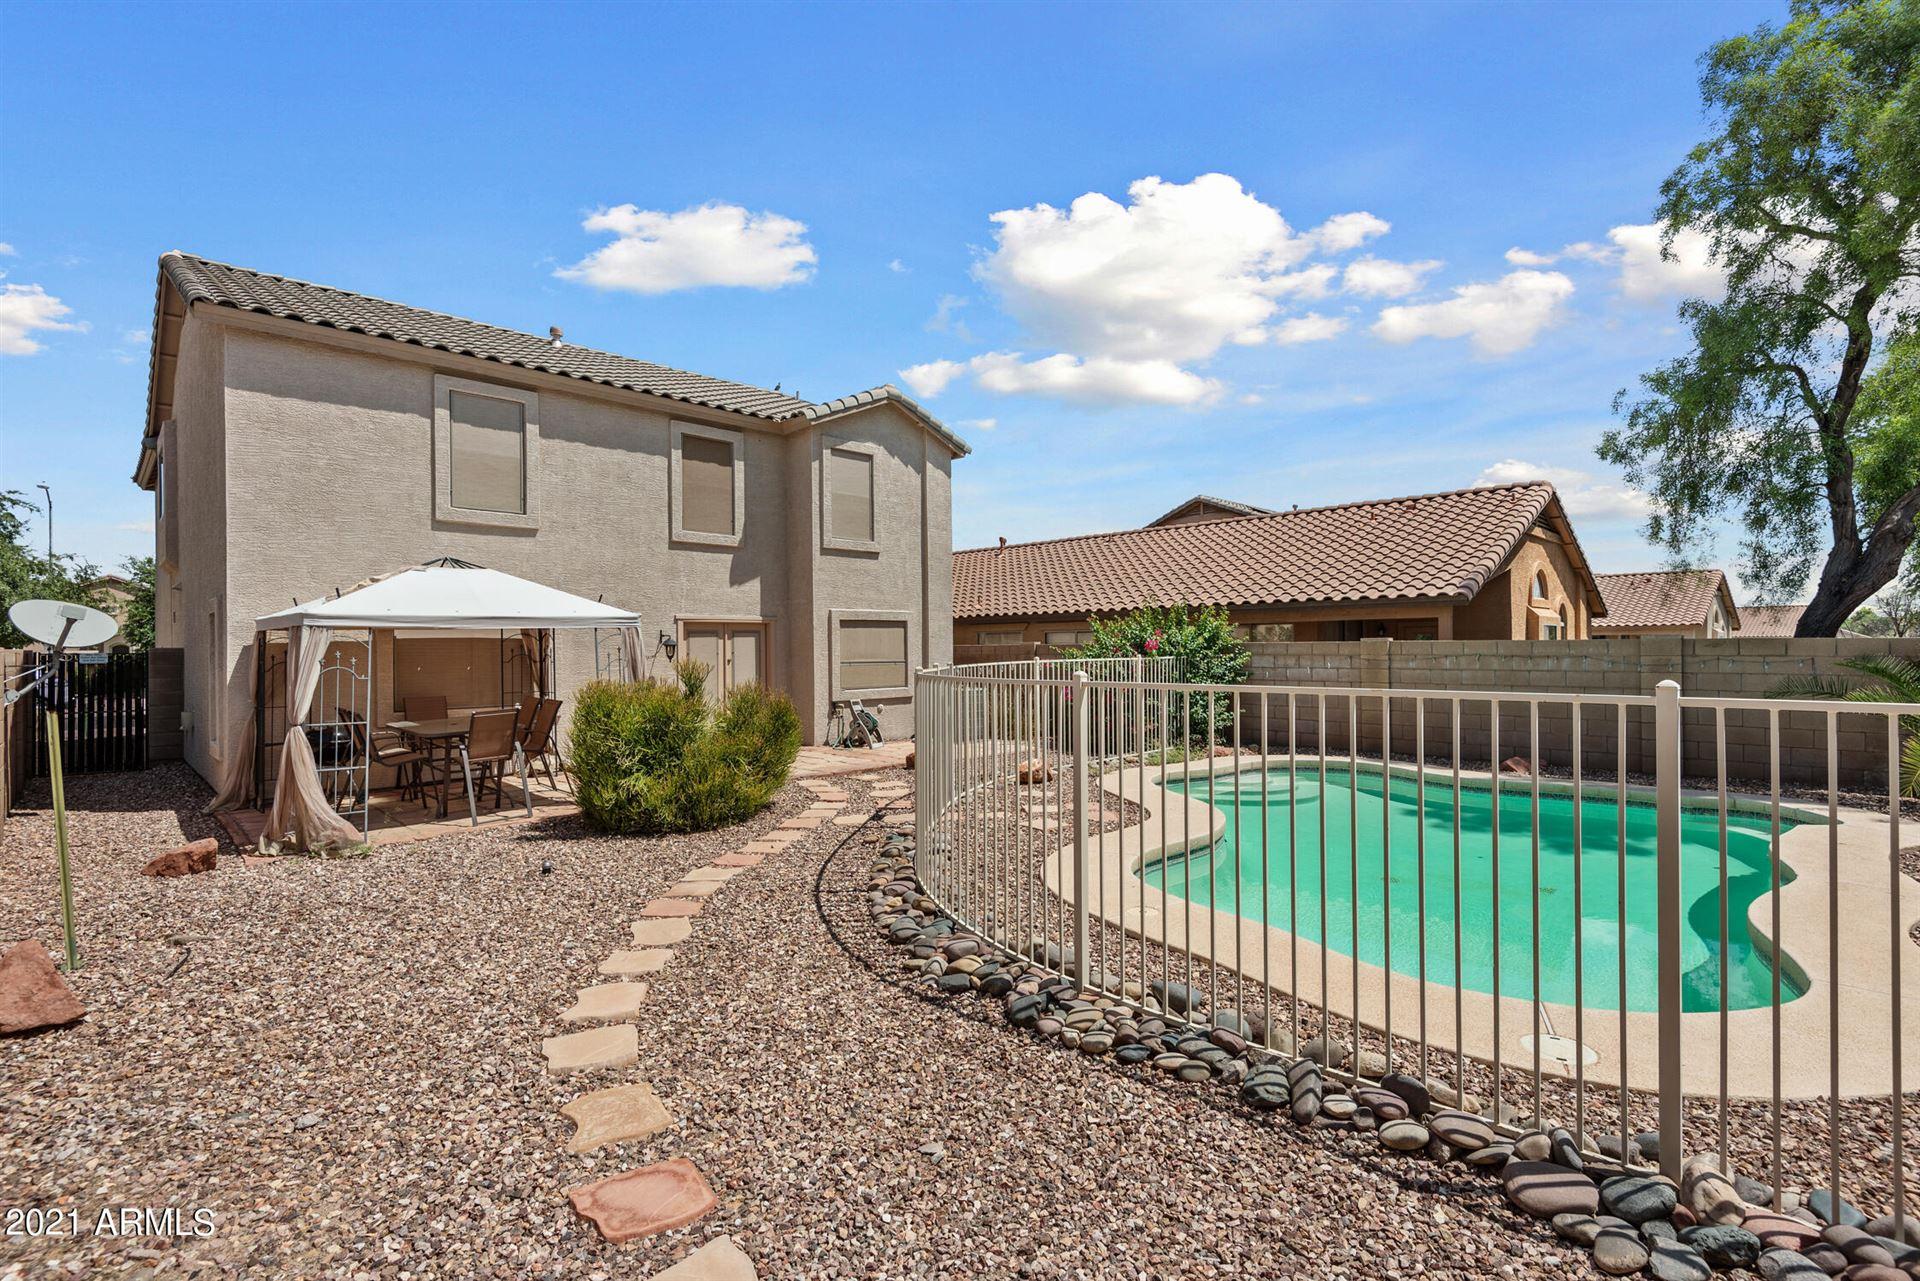 16641 W MONTE CRISTO Avenue, Surprise, AZ 85388 - MLS#: 6281117